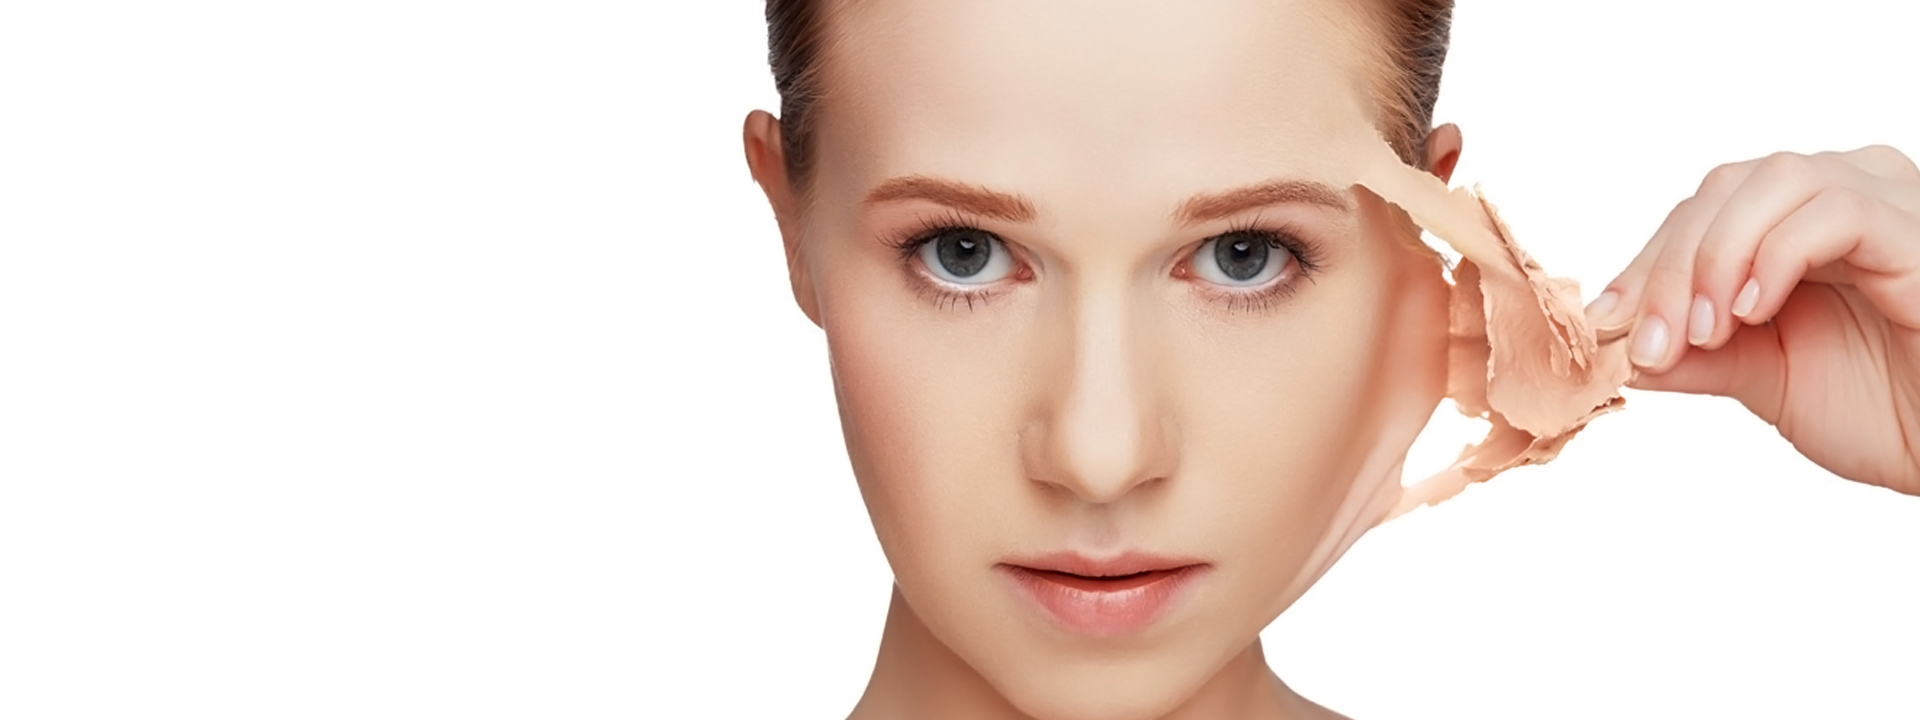 Facial scar treatment brampton toronto